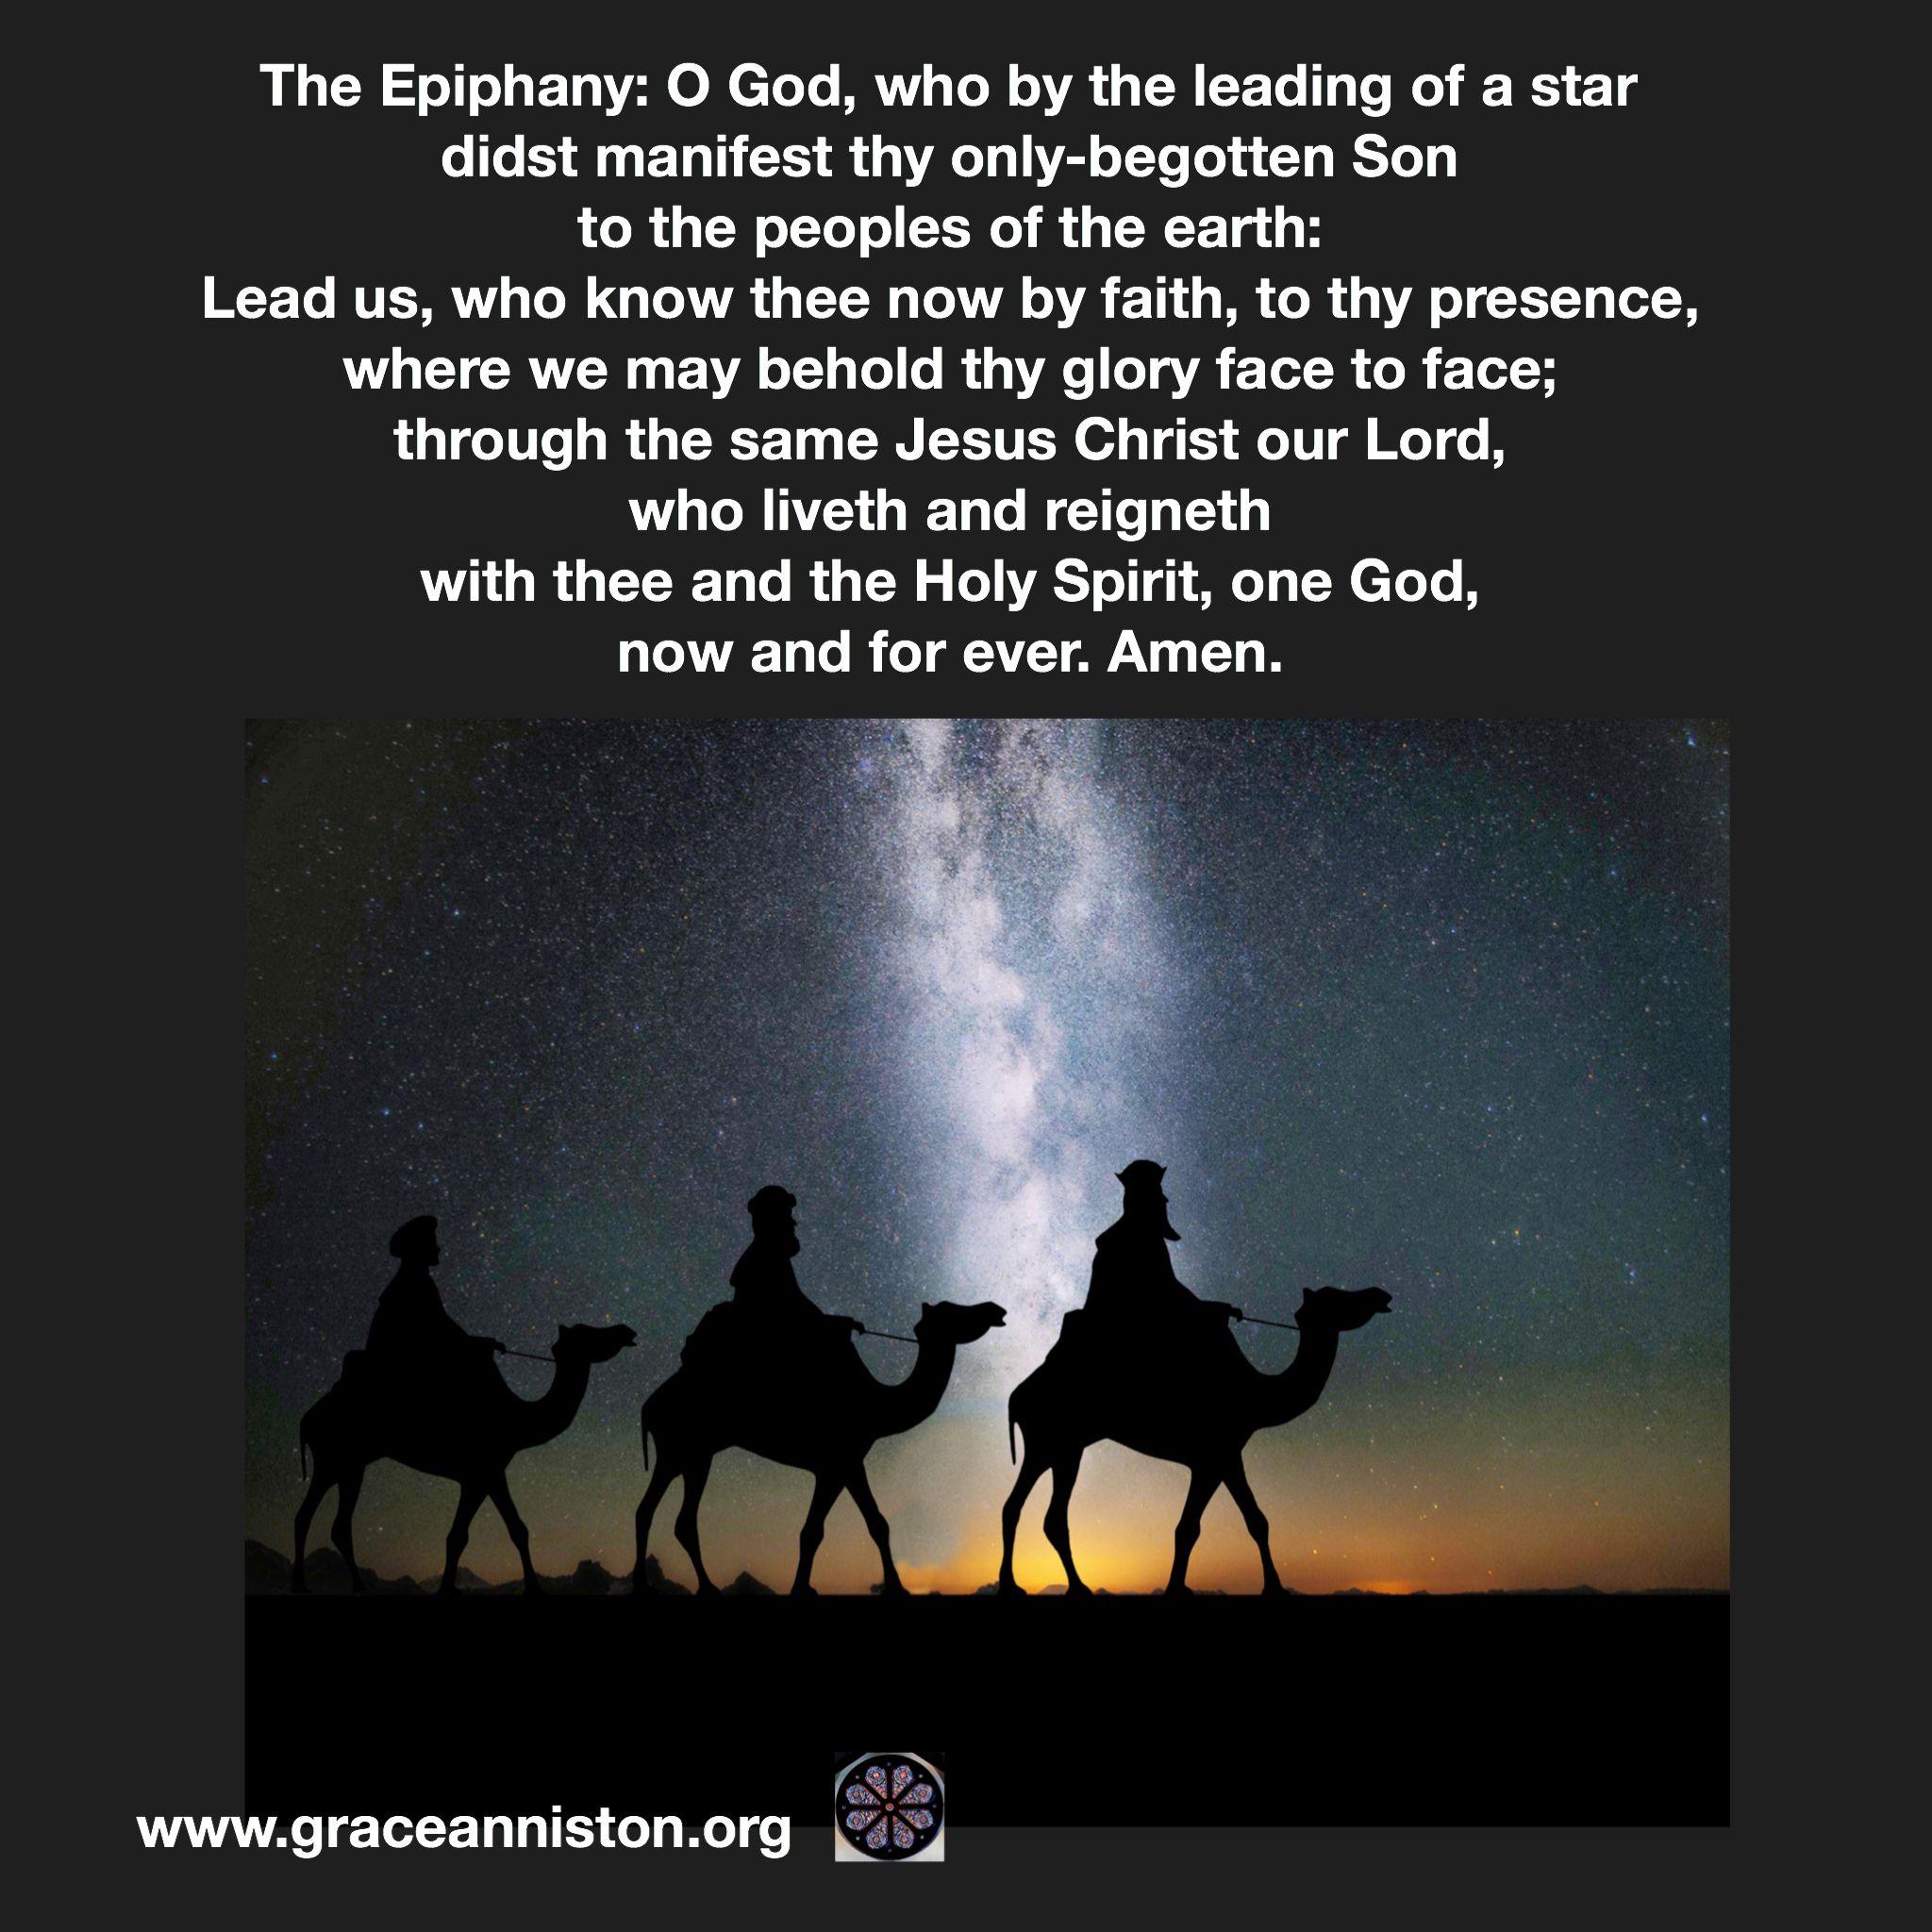 Epiphany prayer | Prayer photos, Epiphany, Prayers